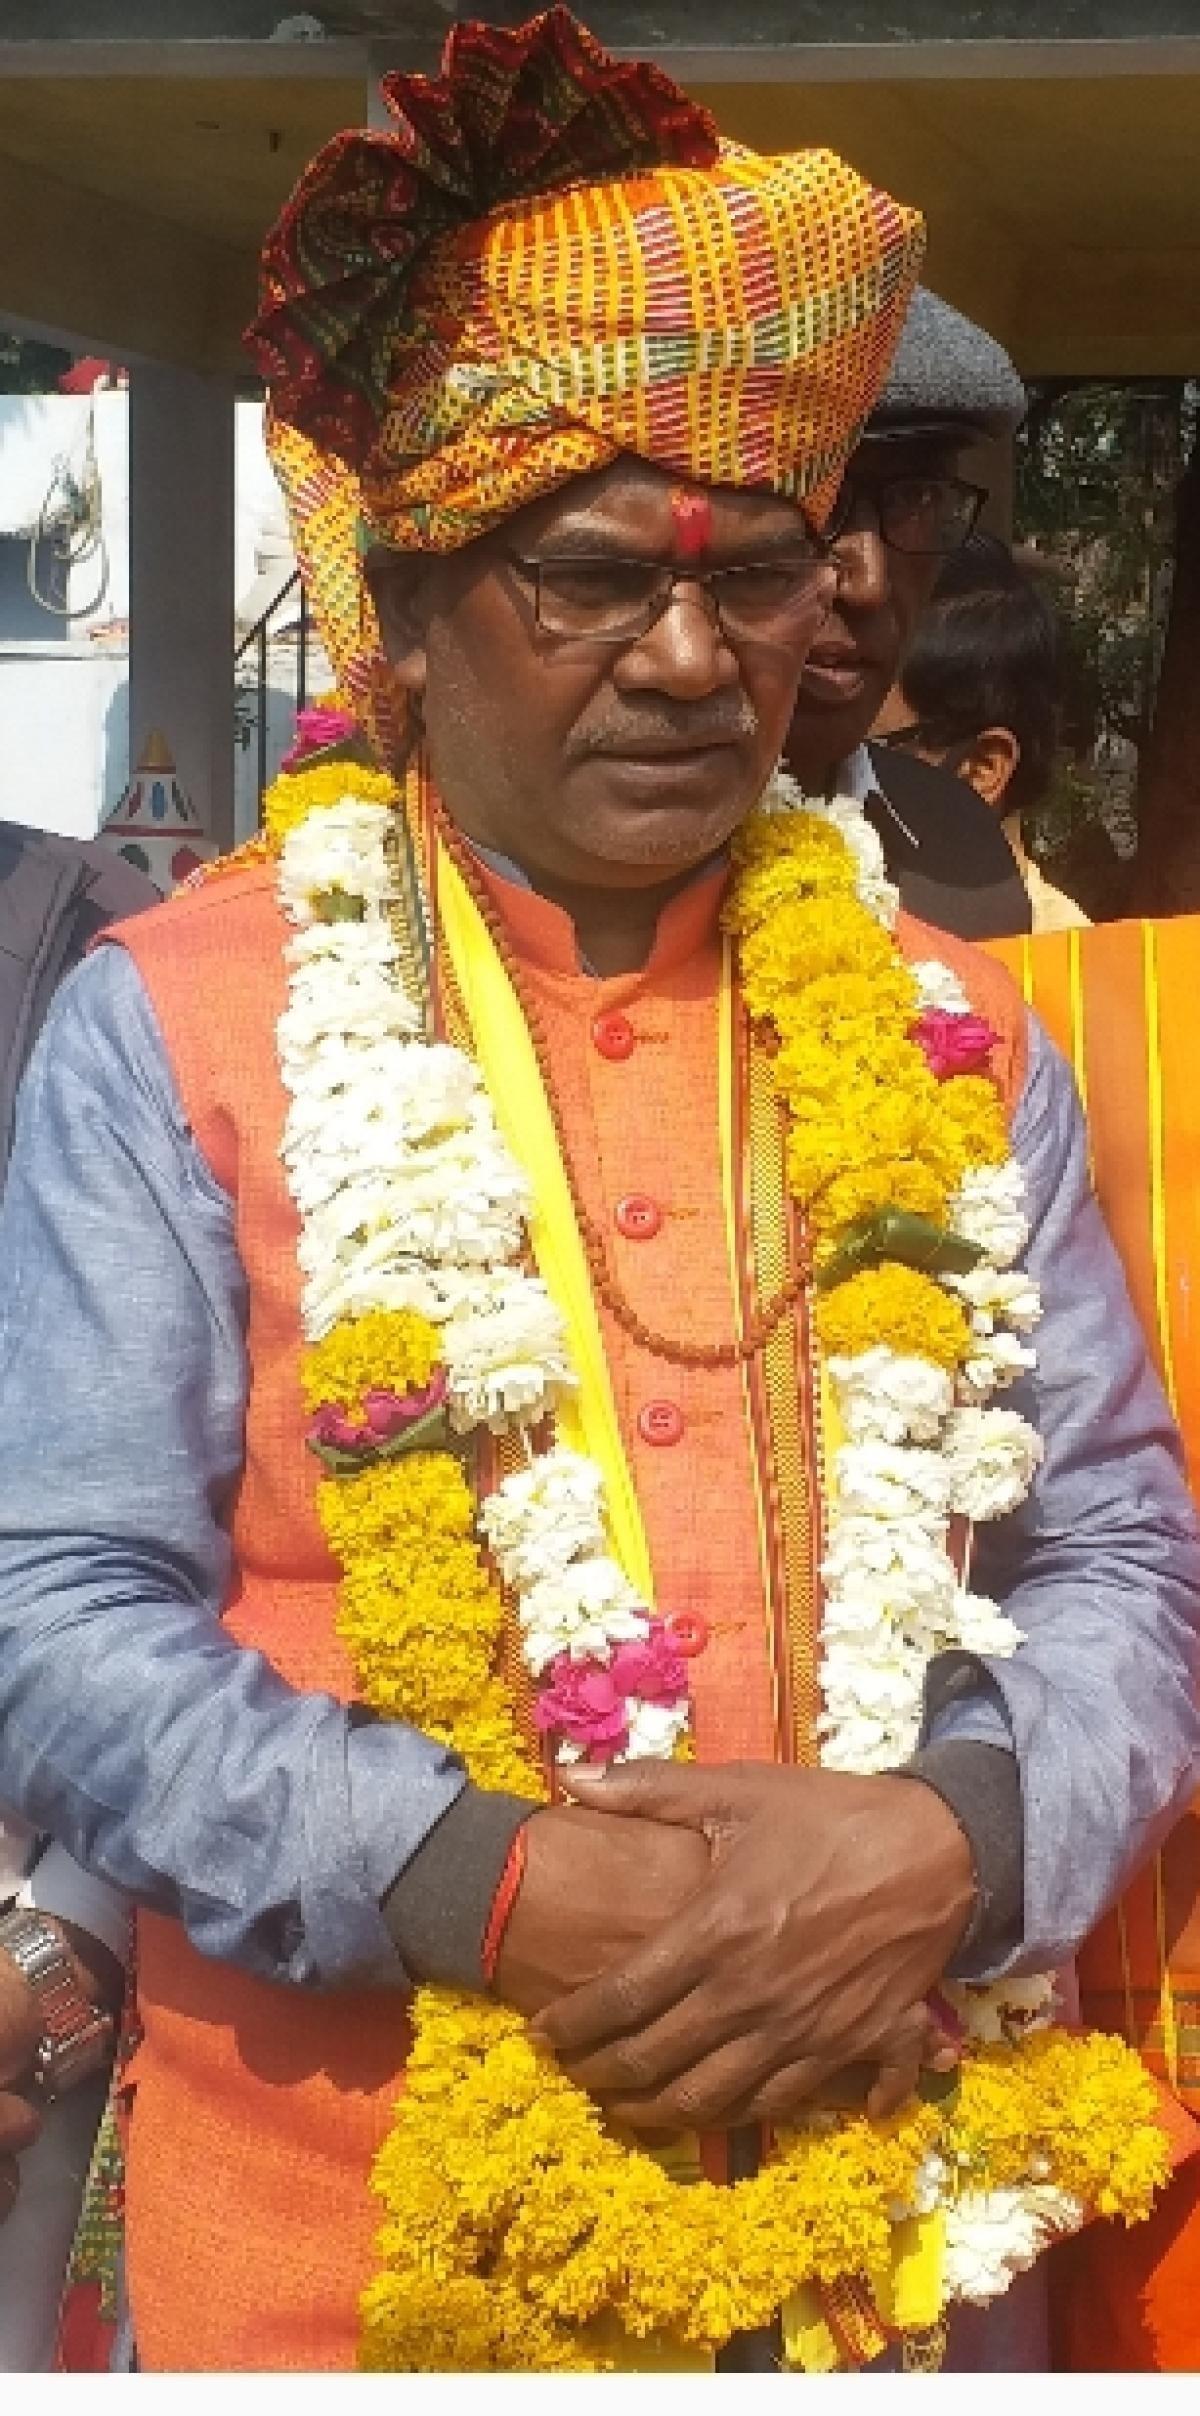 Indore: Ram temple movement is nearly 500 years old: Ram Janmabhumi trustee